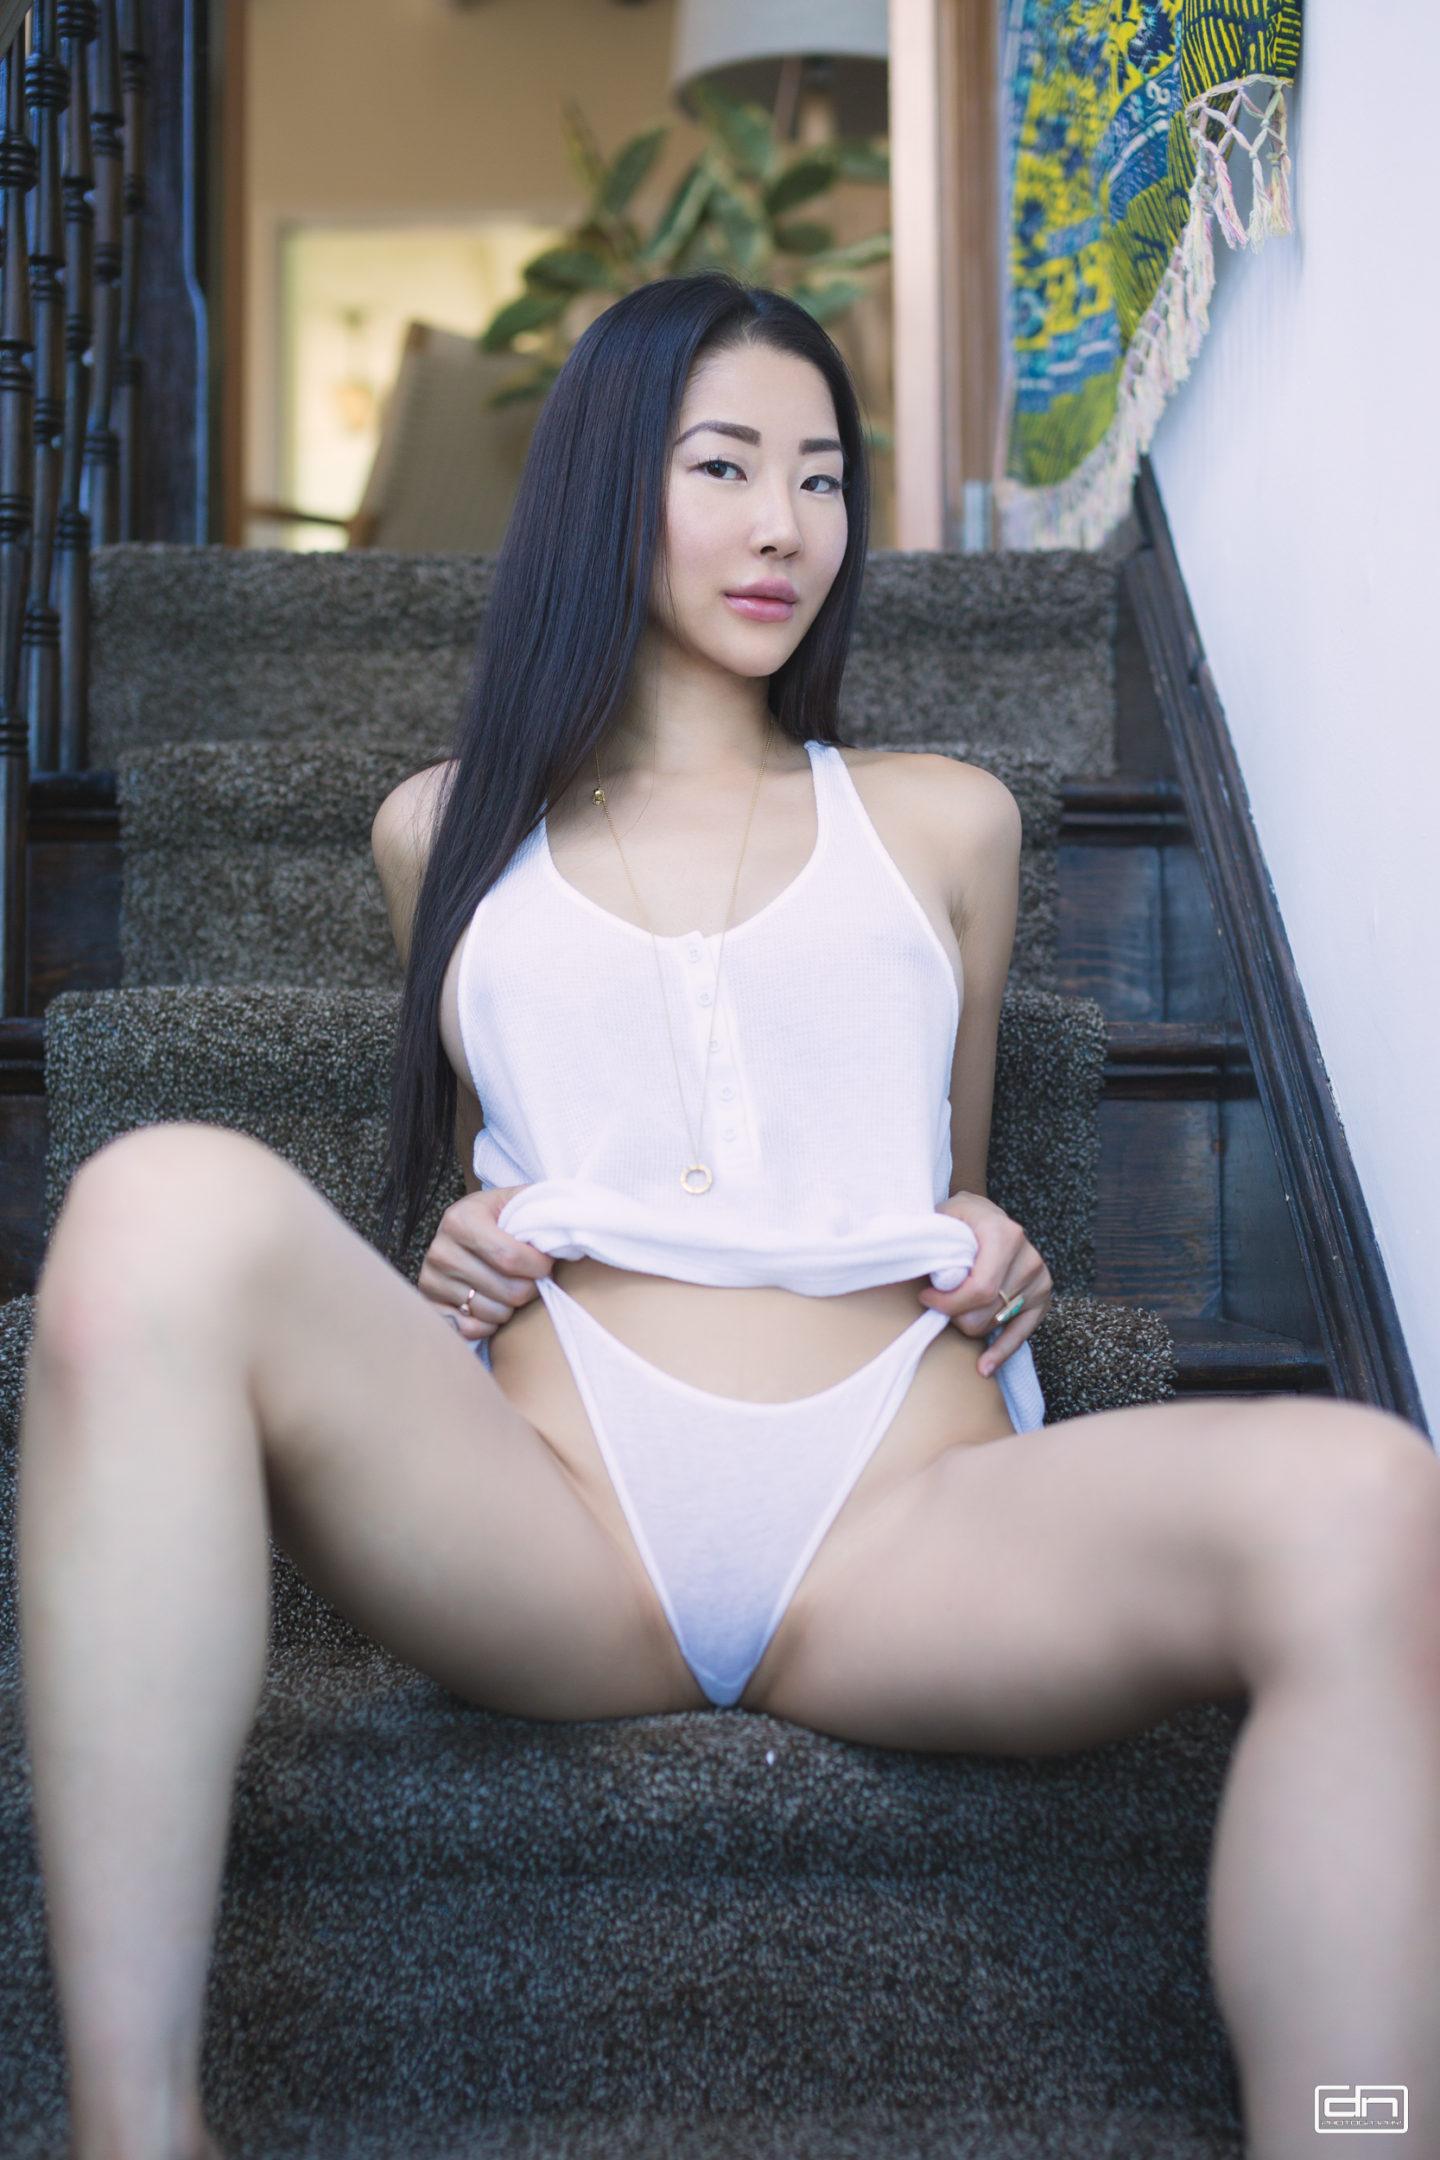 Organic cotton underwear, style blogger Moon.